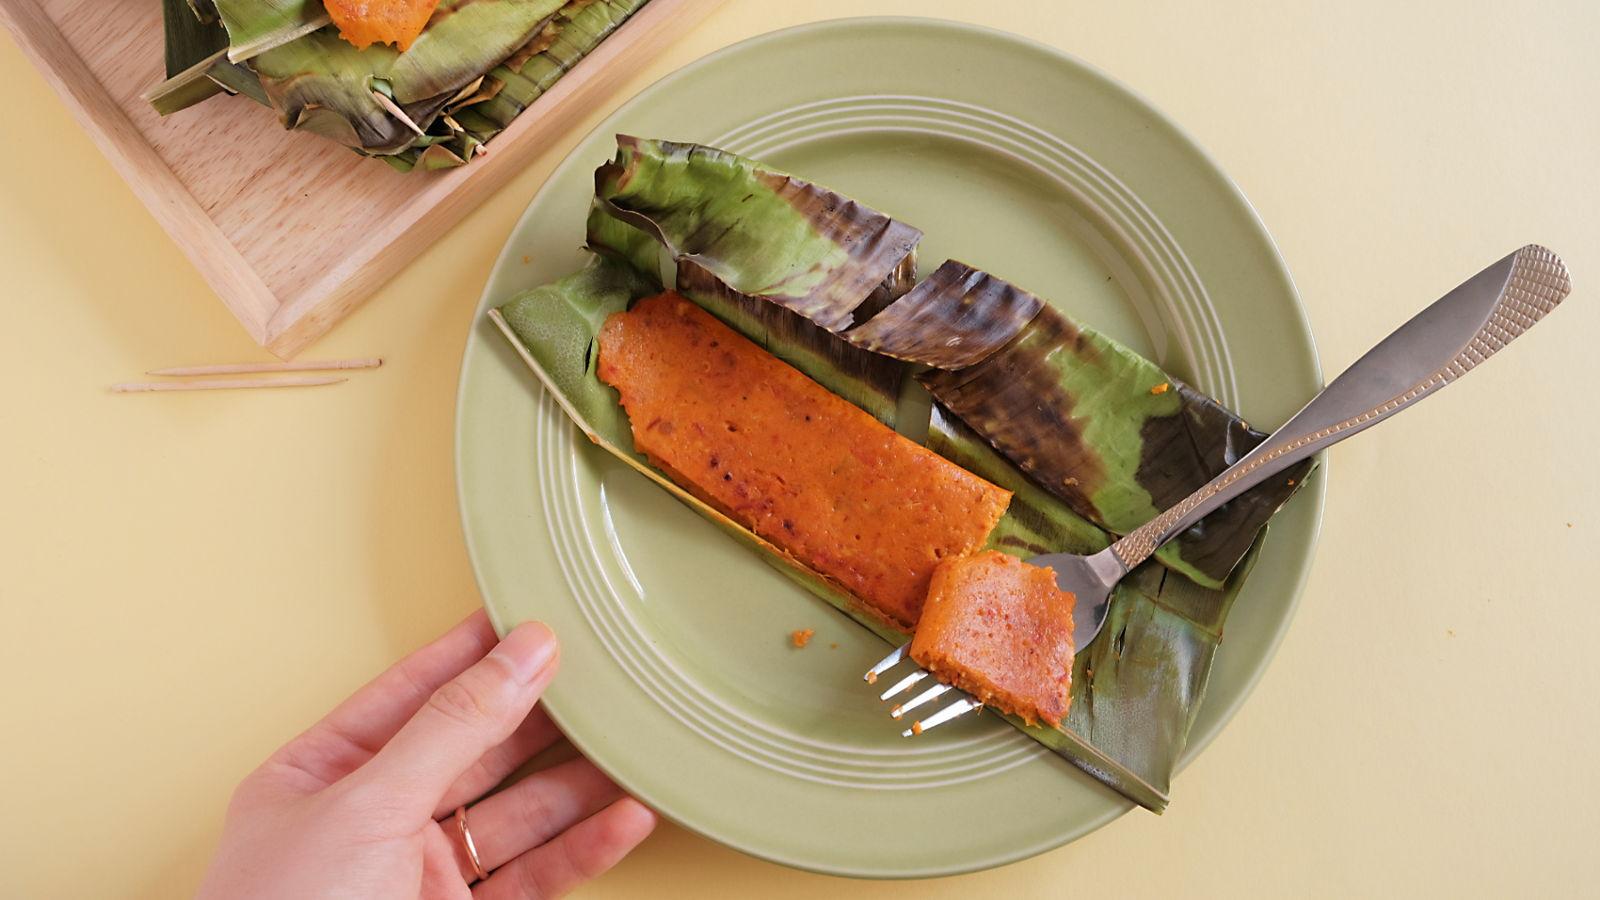 Otak-Otak (Grilled Fish Cake)